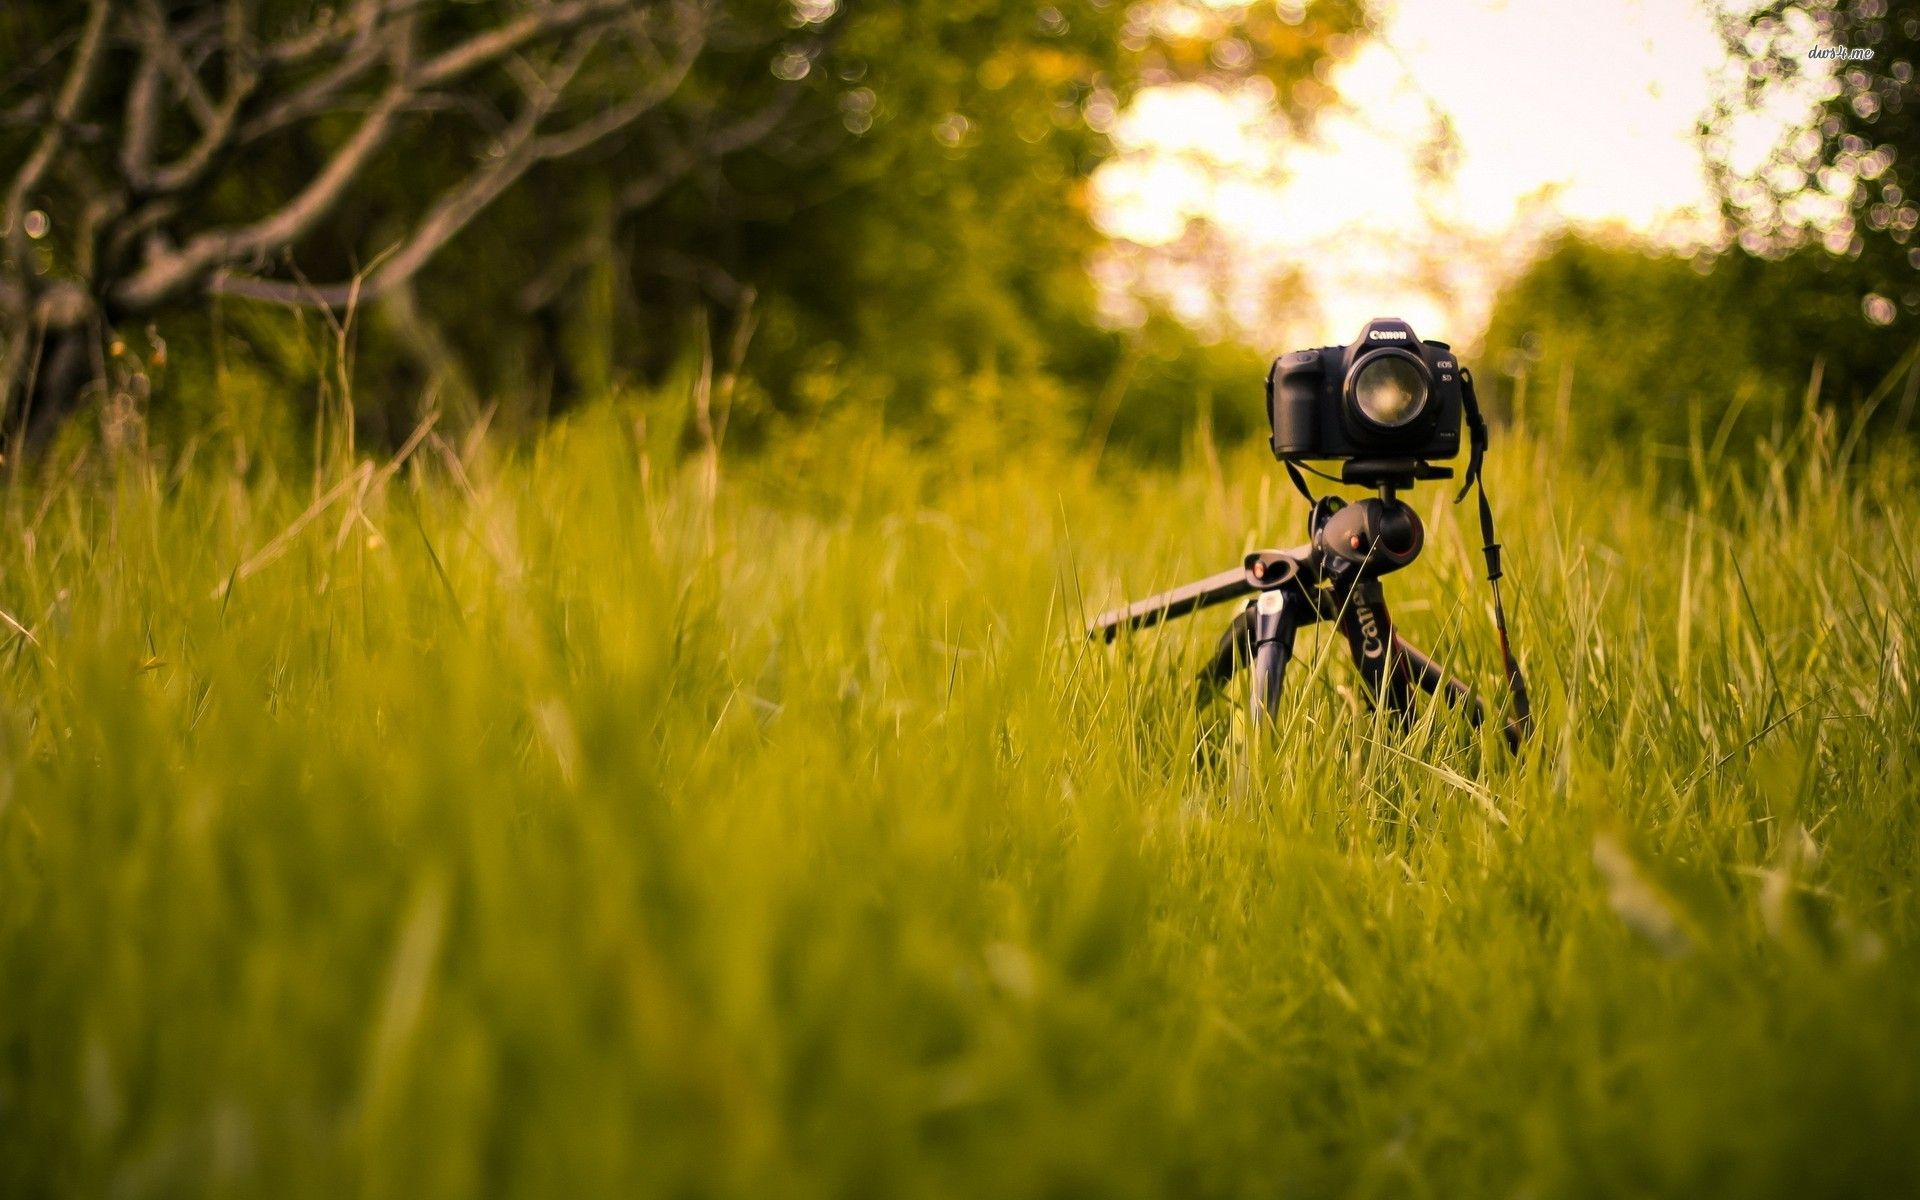 Hd wallpaper camera - Canon Wallpapers Full Hd Wallpaper Search Canon Cameras Eos Pinterest Hd Wallpaper